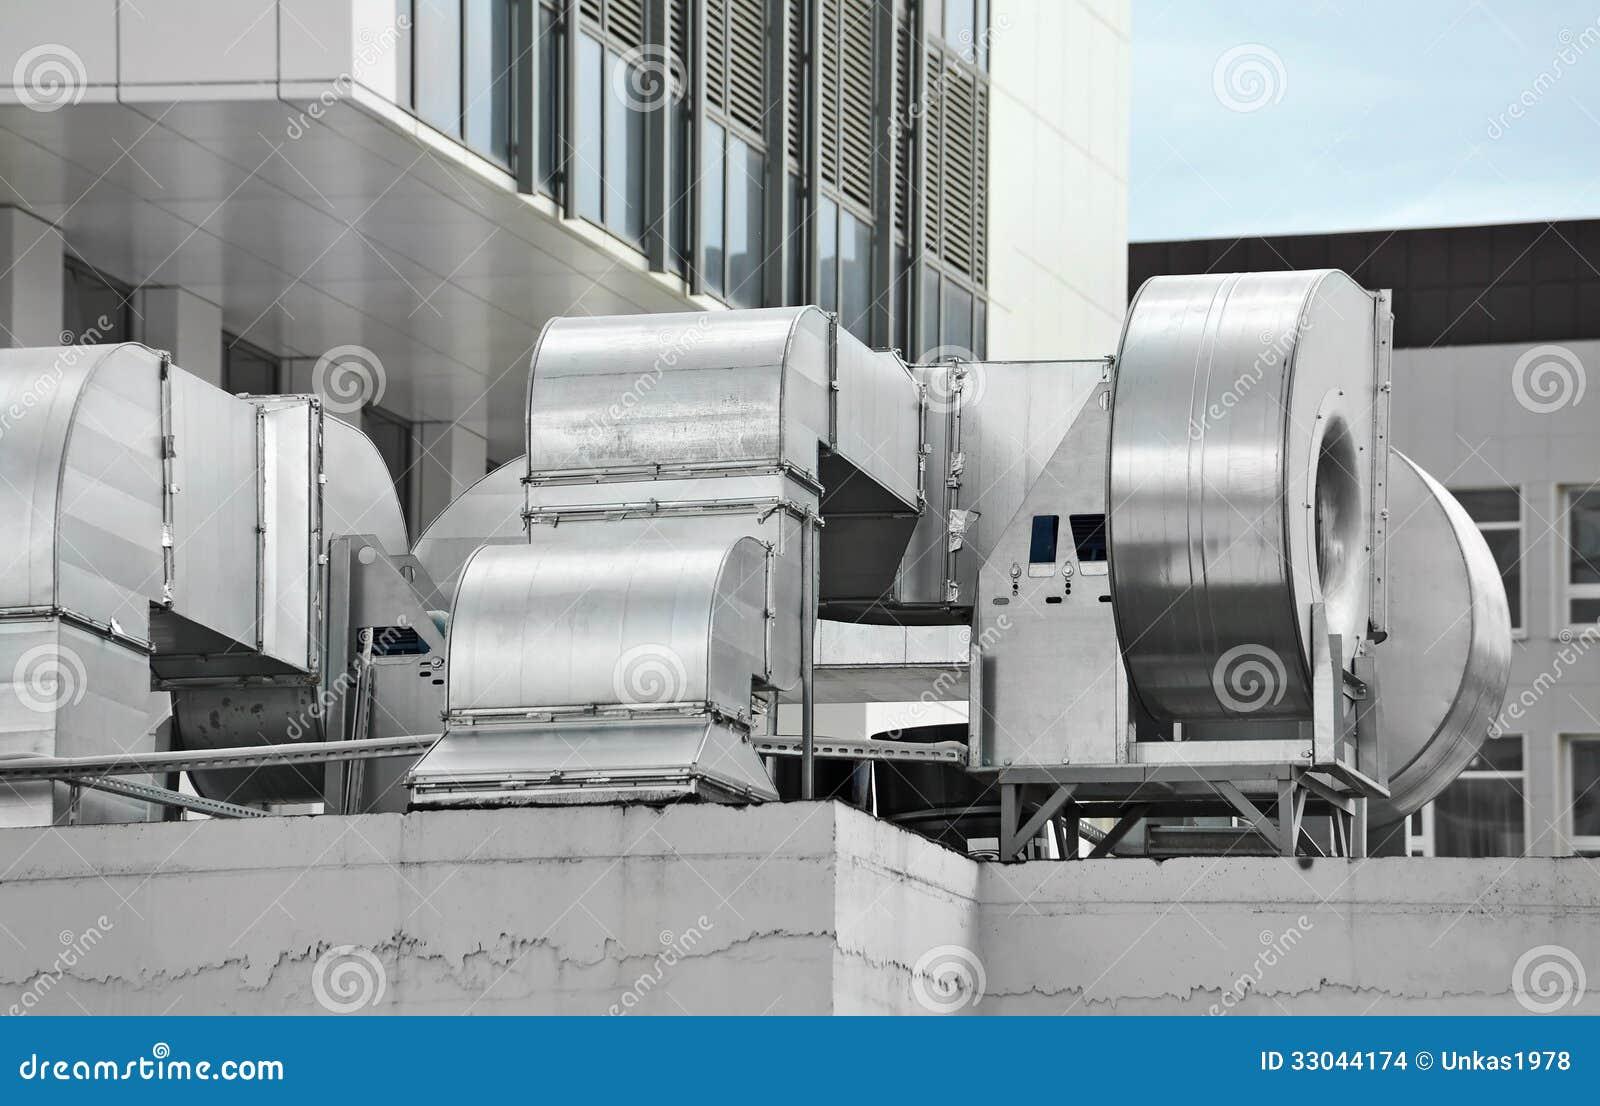 Industrial Air Ventilator : Industrial ventilation system stock images image